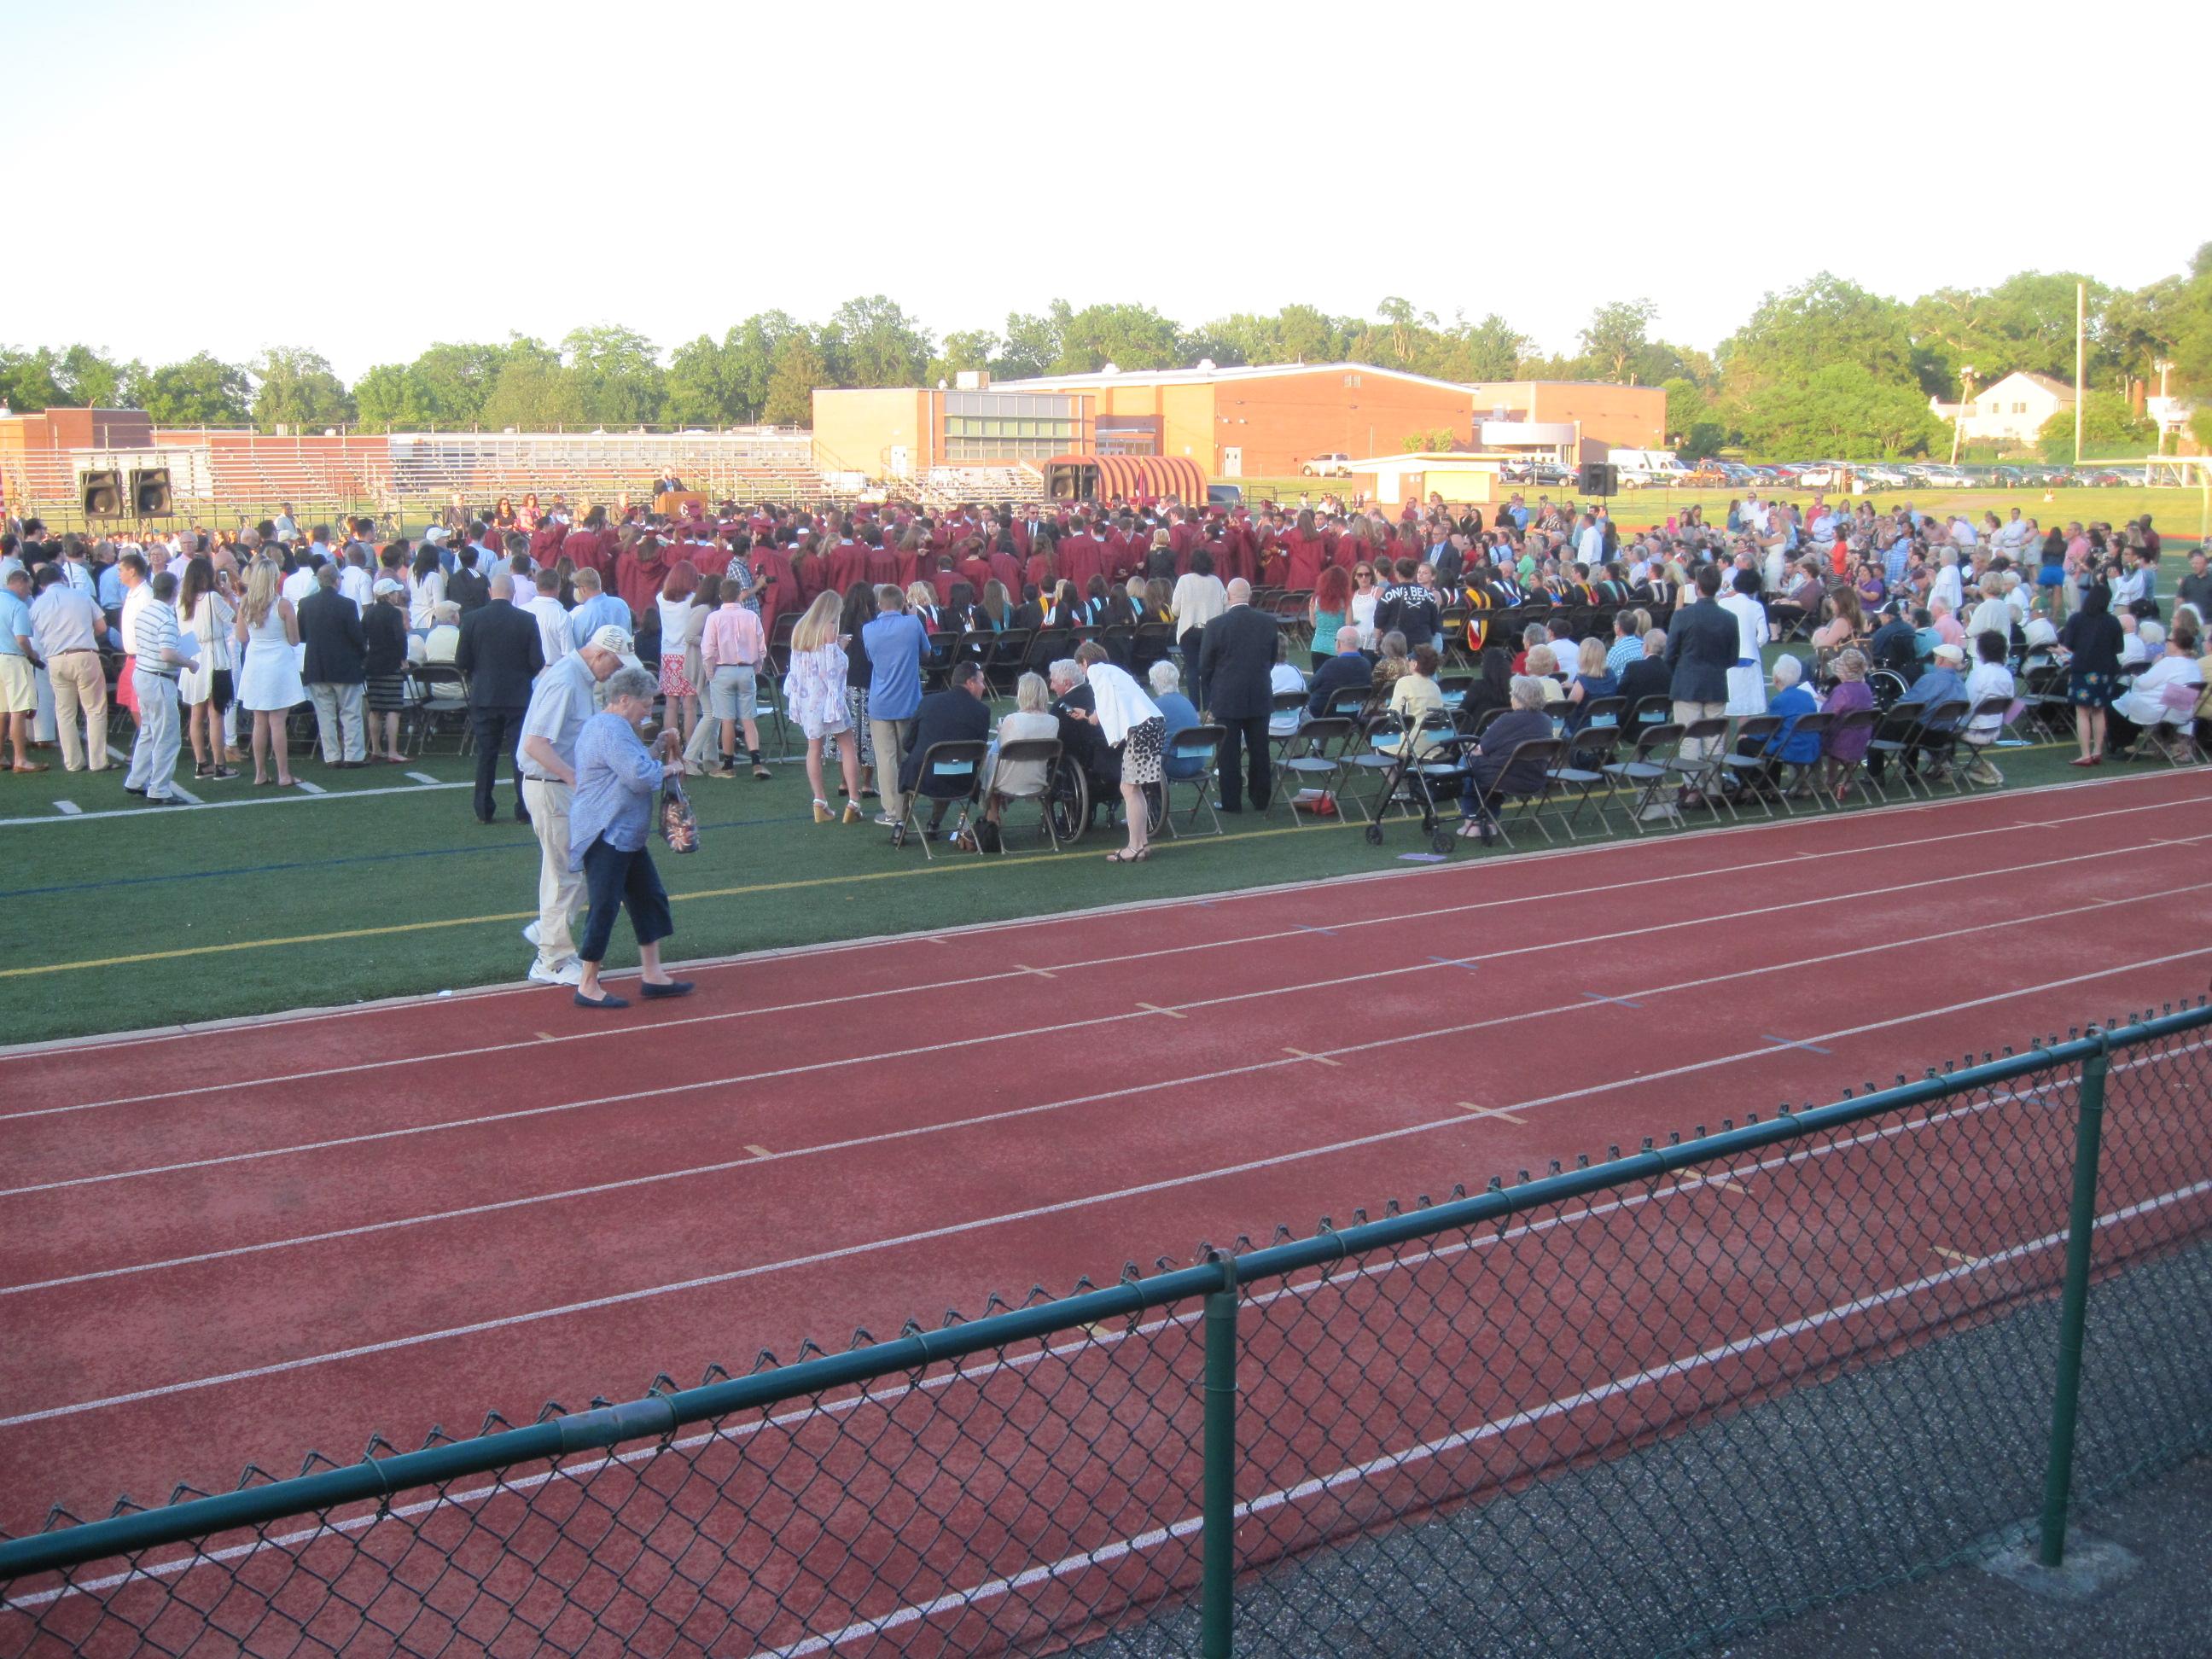 950e448bb7d29f7ce2bd_Madison_graduation_6-17-16_017.JPG